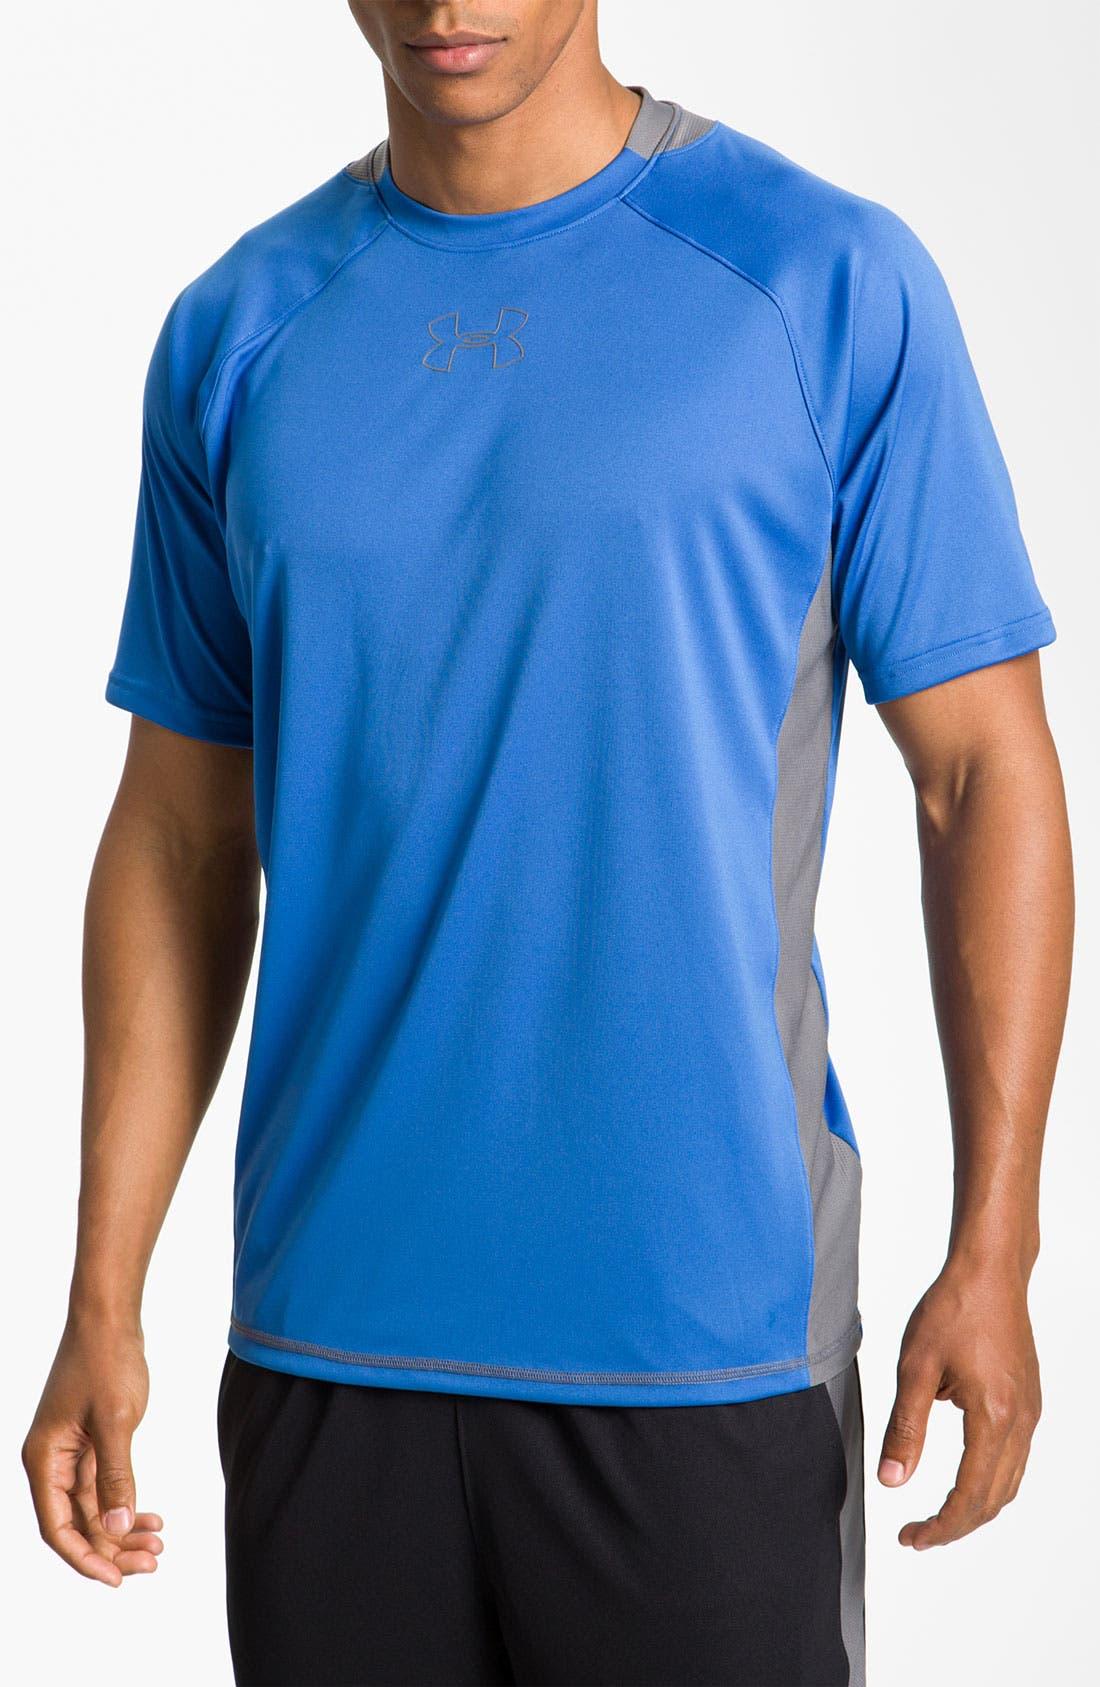 Main Image - Under Armour 'Advent' Regular Fit T-Shirt